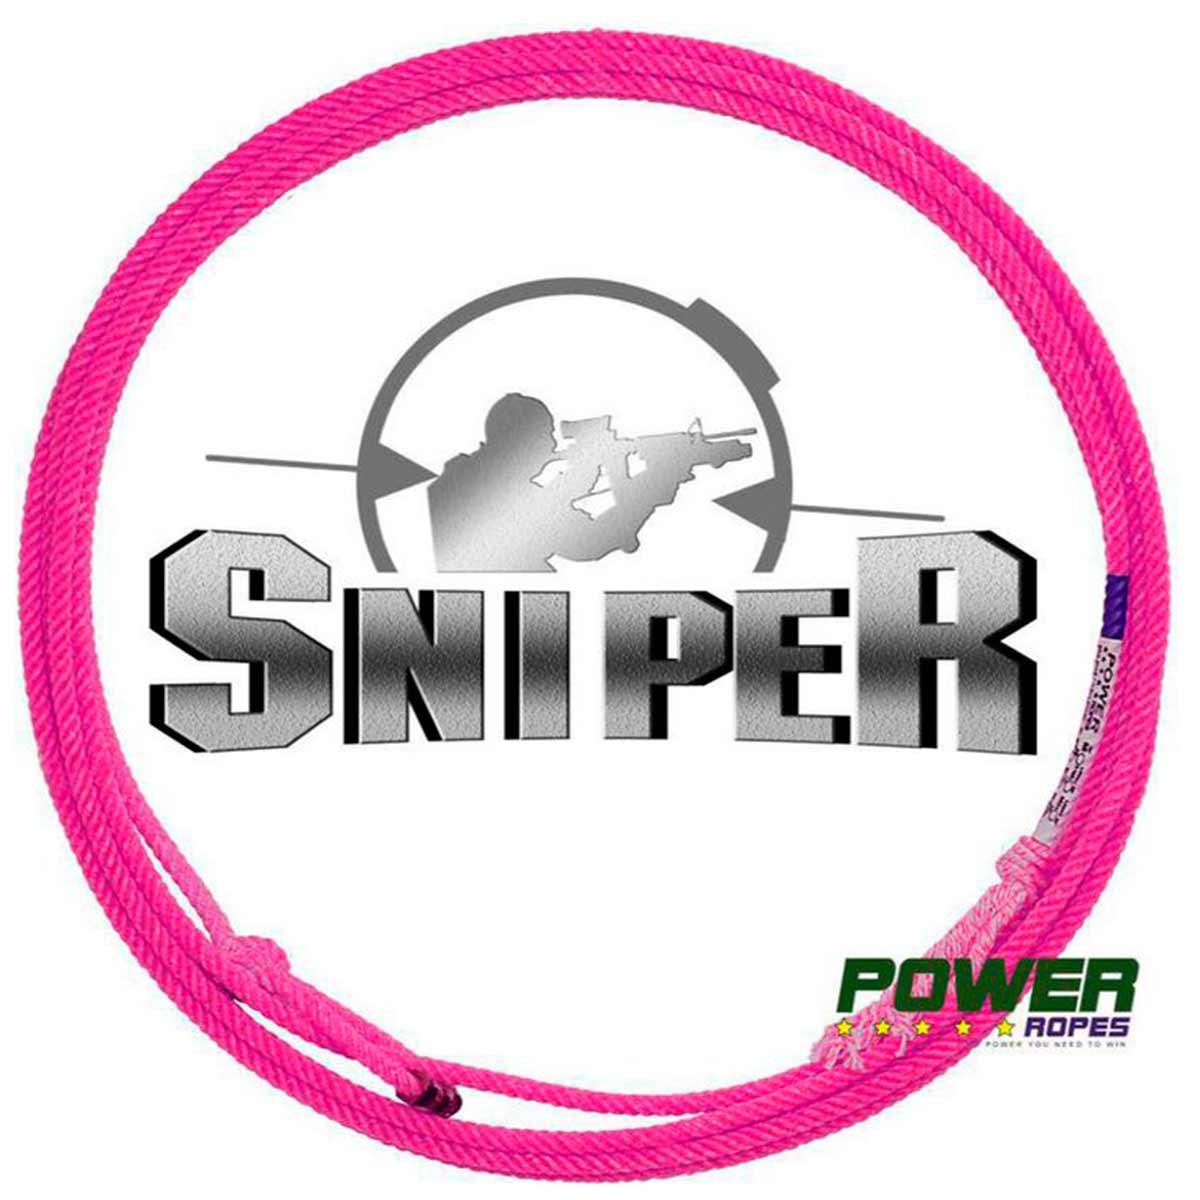 Corda Laço Power Ropes Sniper 4 Tentos